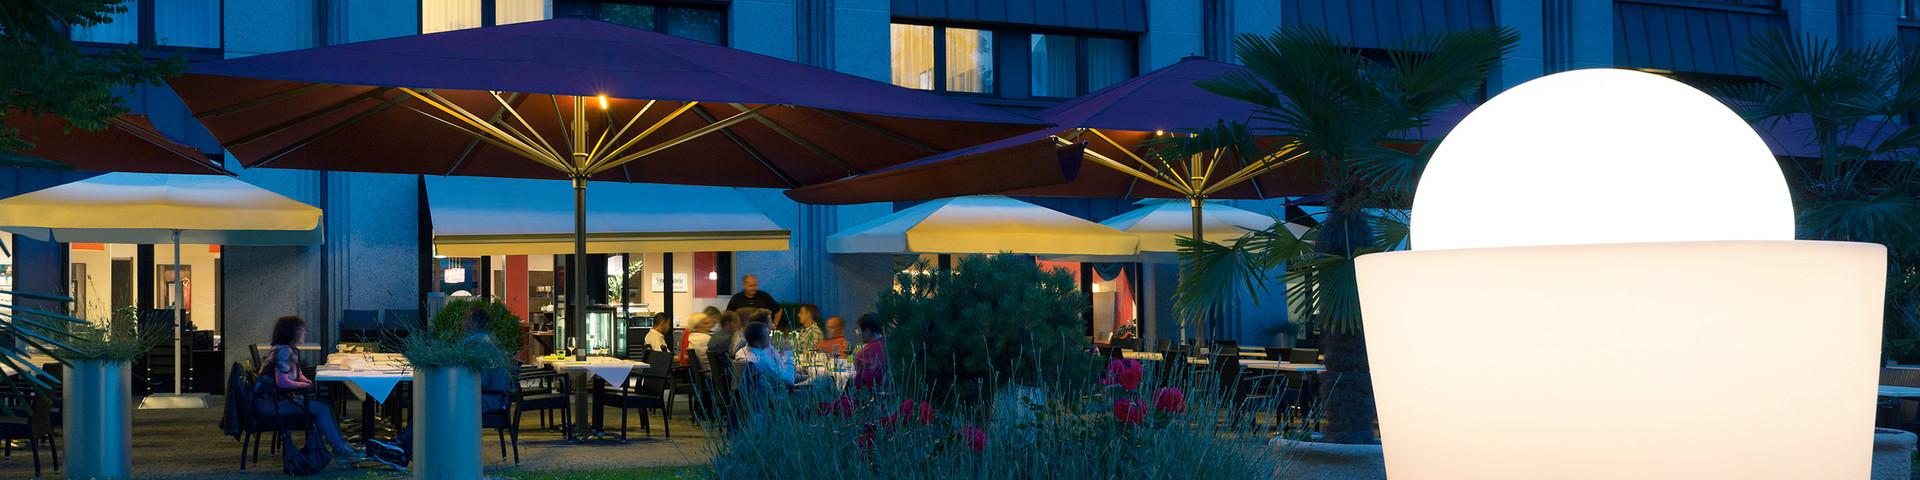 Hotel Mercure Bregenz - Aussenansicht © Hotel Mercure Bregenz